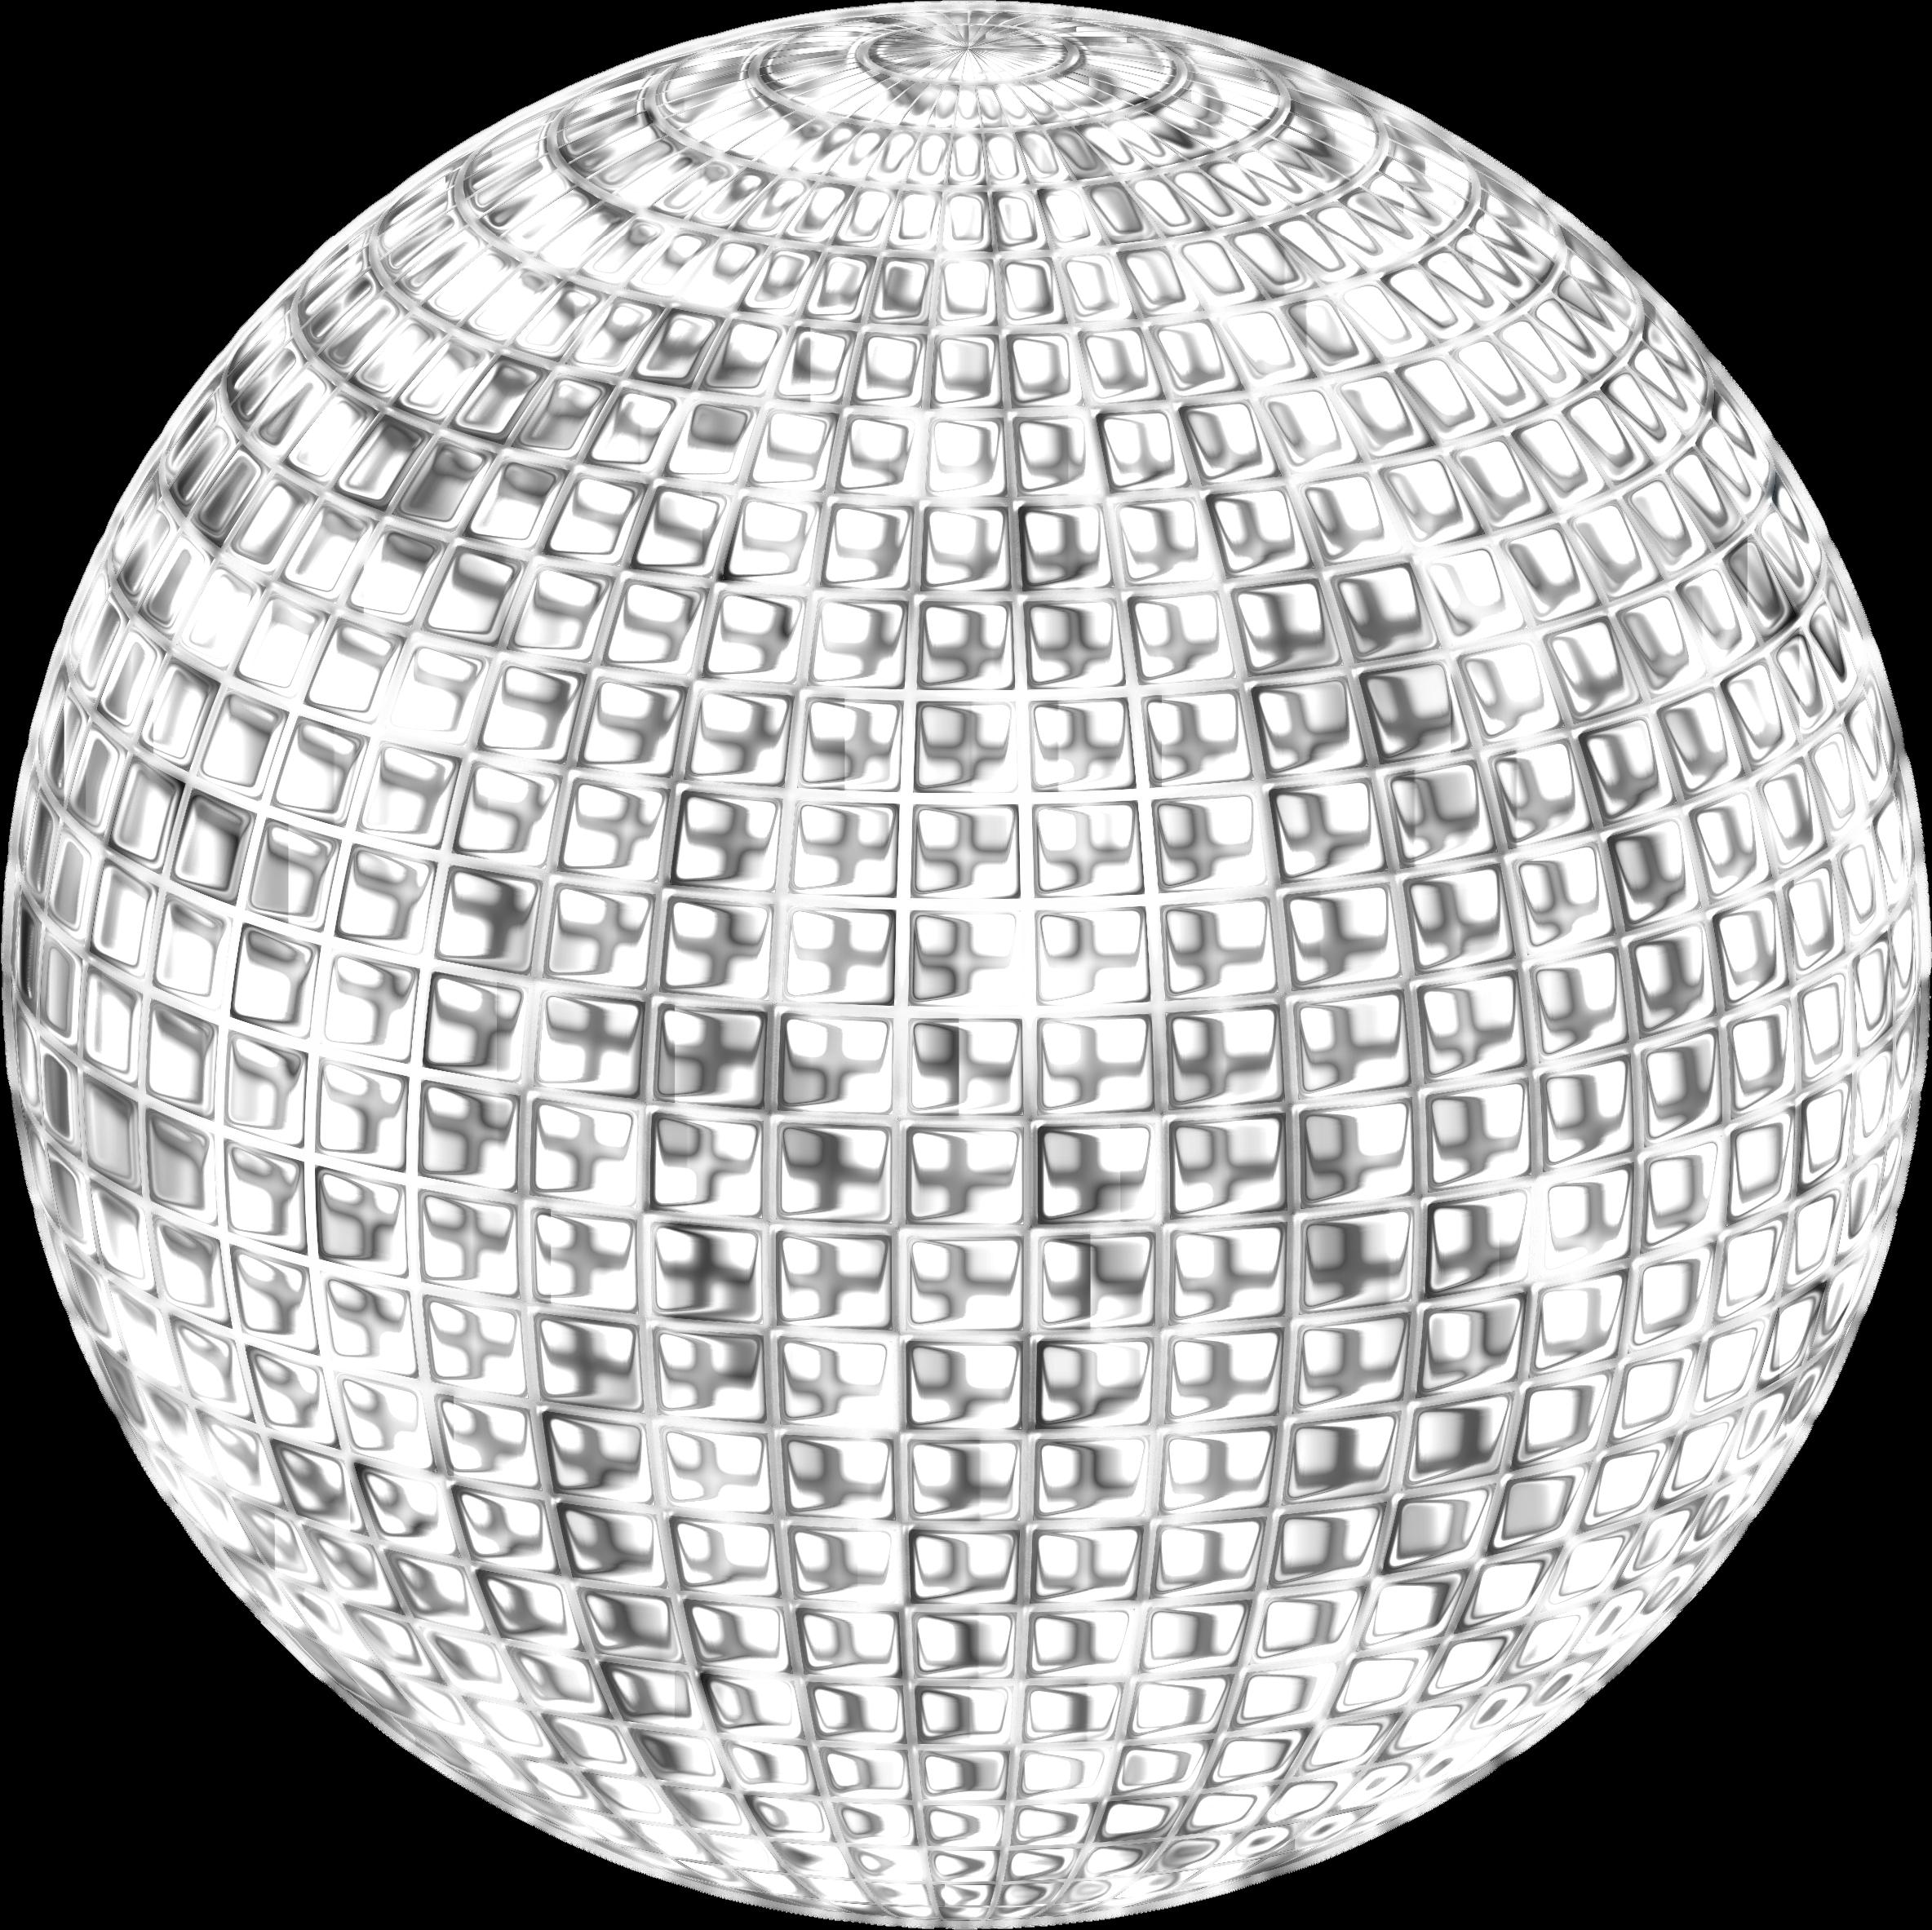 Disco clipart disco ball. Glimmering enhanced no background